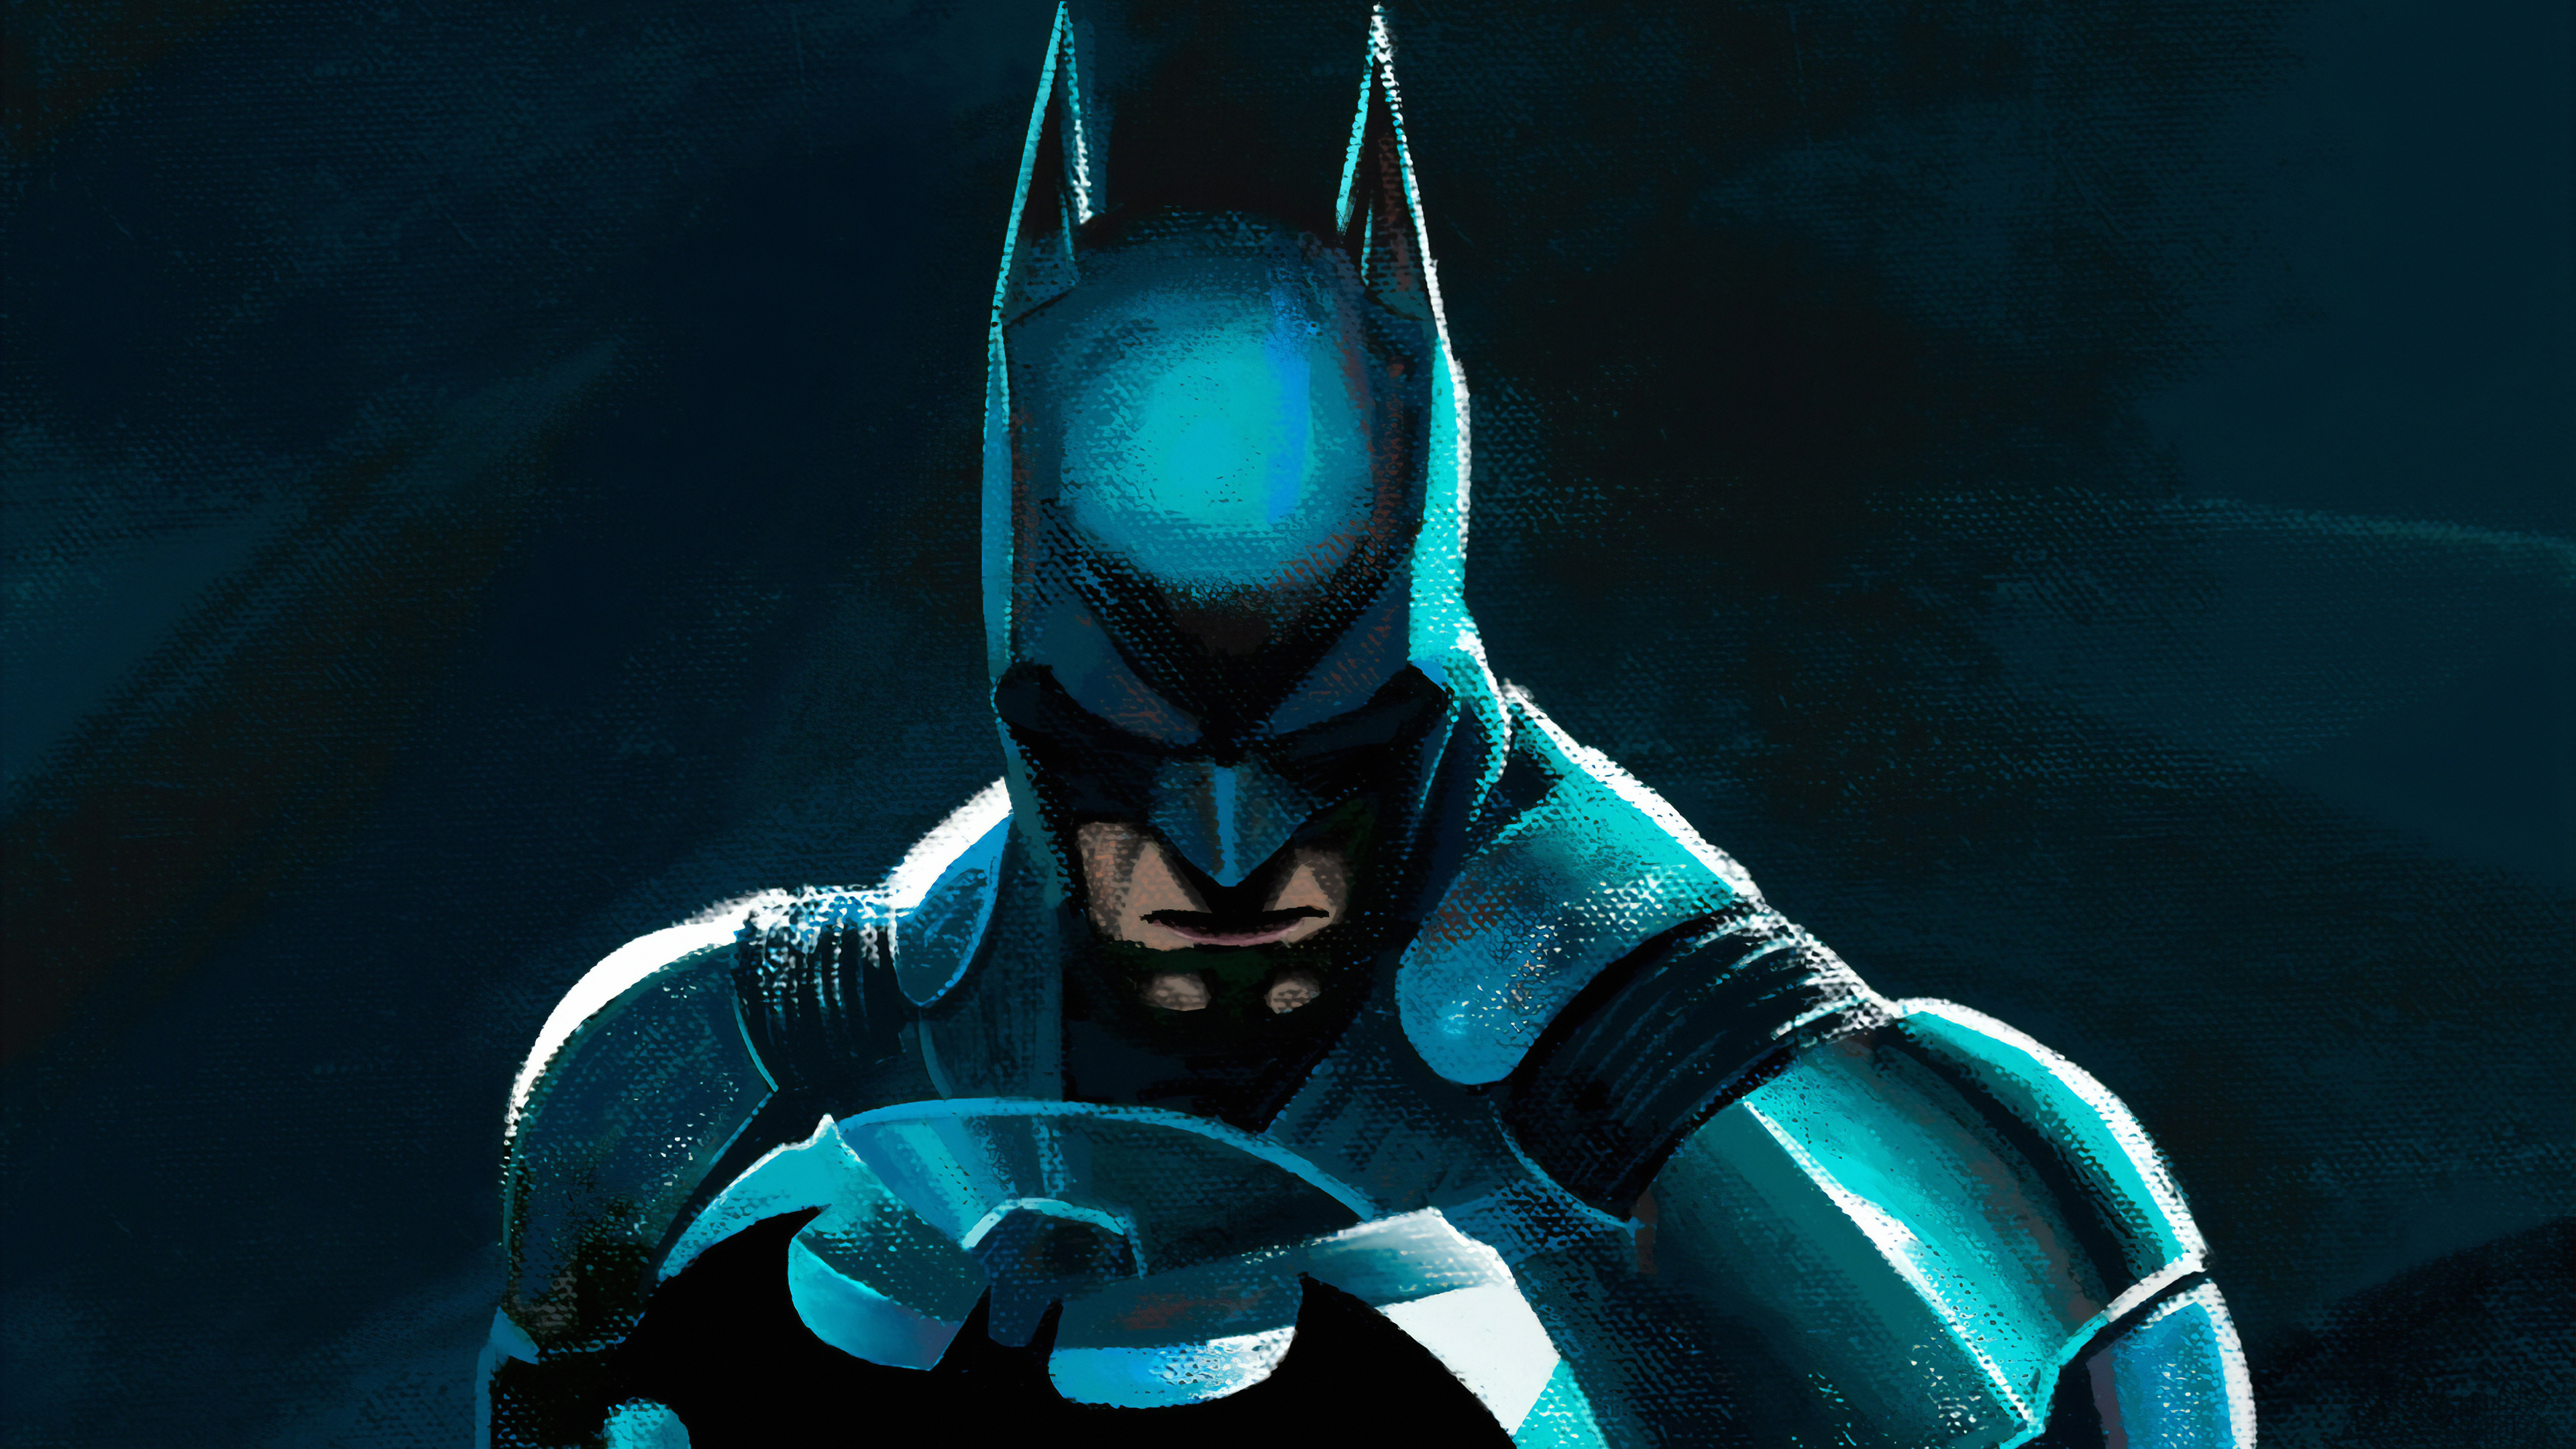 batman new art 1570394457 - Batman New art - superheroes wallpapers, portrait wallpapers, hd-wallpapers, batman wallpapers, artwork wallpapers, 4k-wallpapers